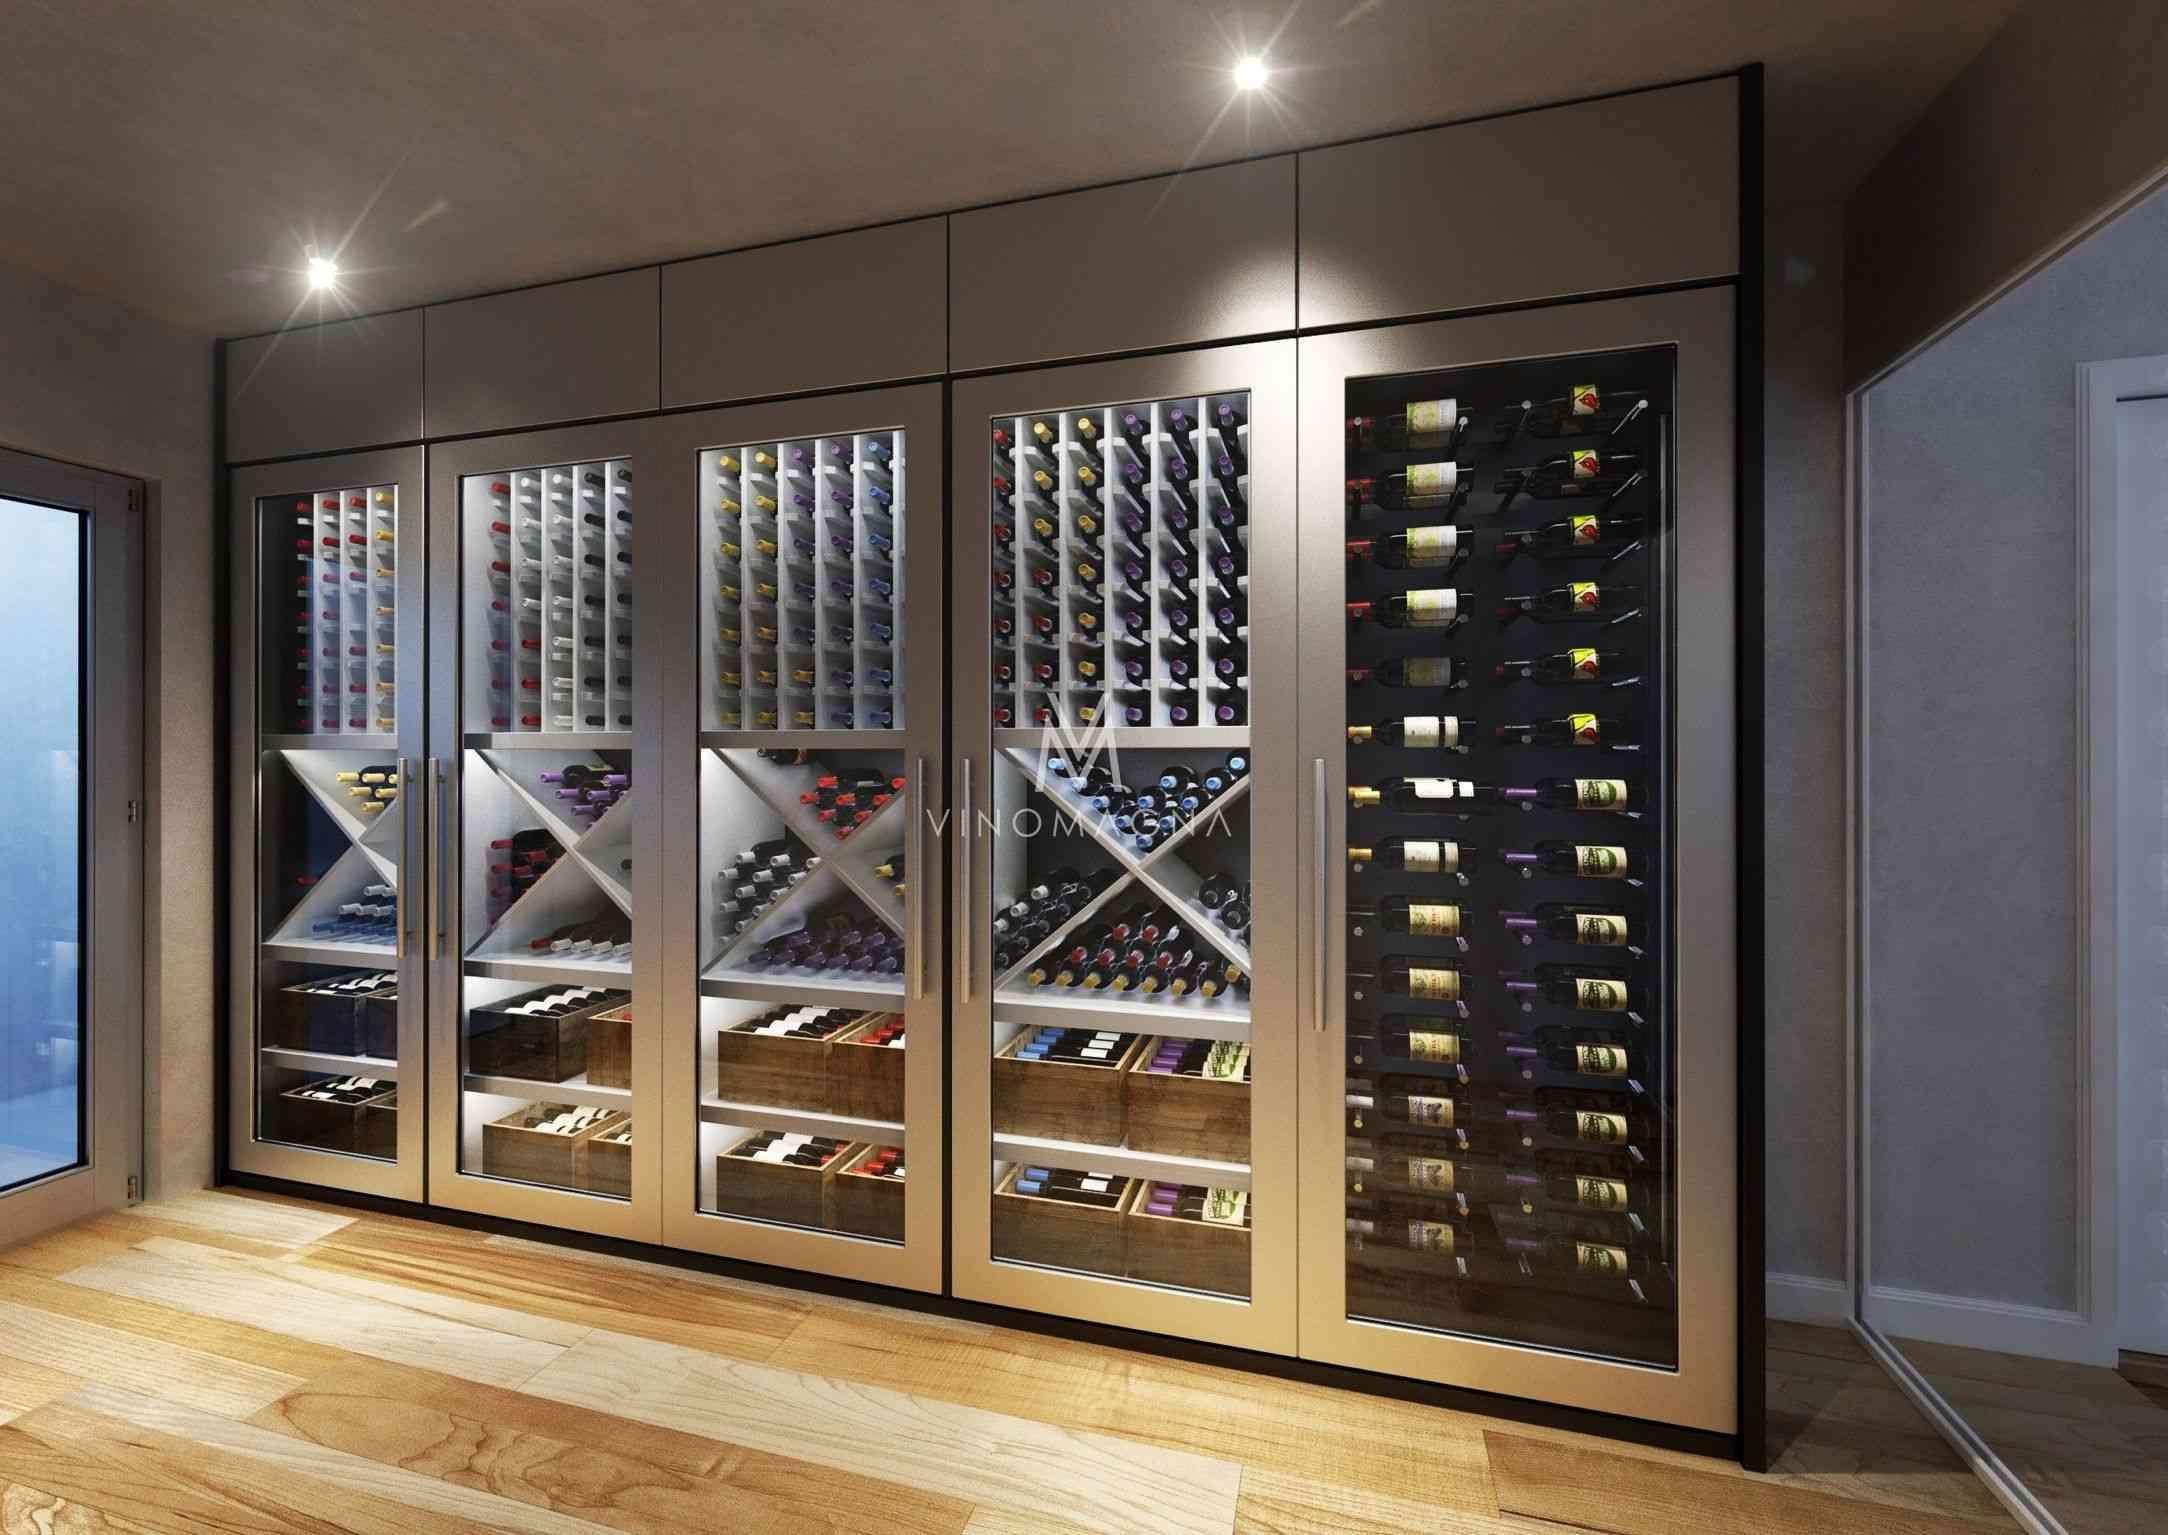 25 Luxury Modern Wine Cellar Ideas To Make Your Happy Paijo